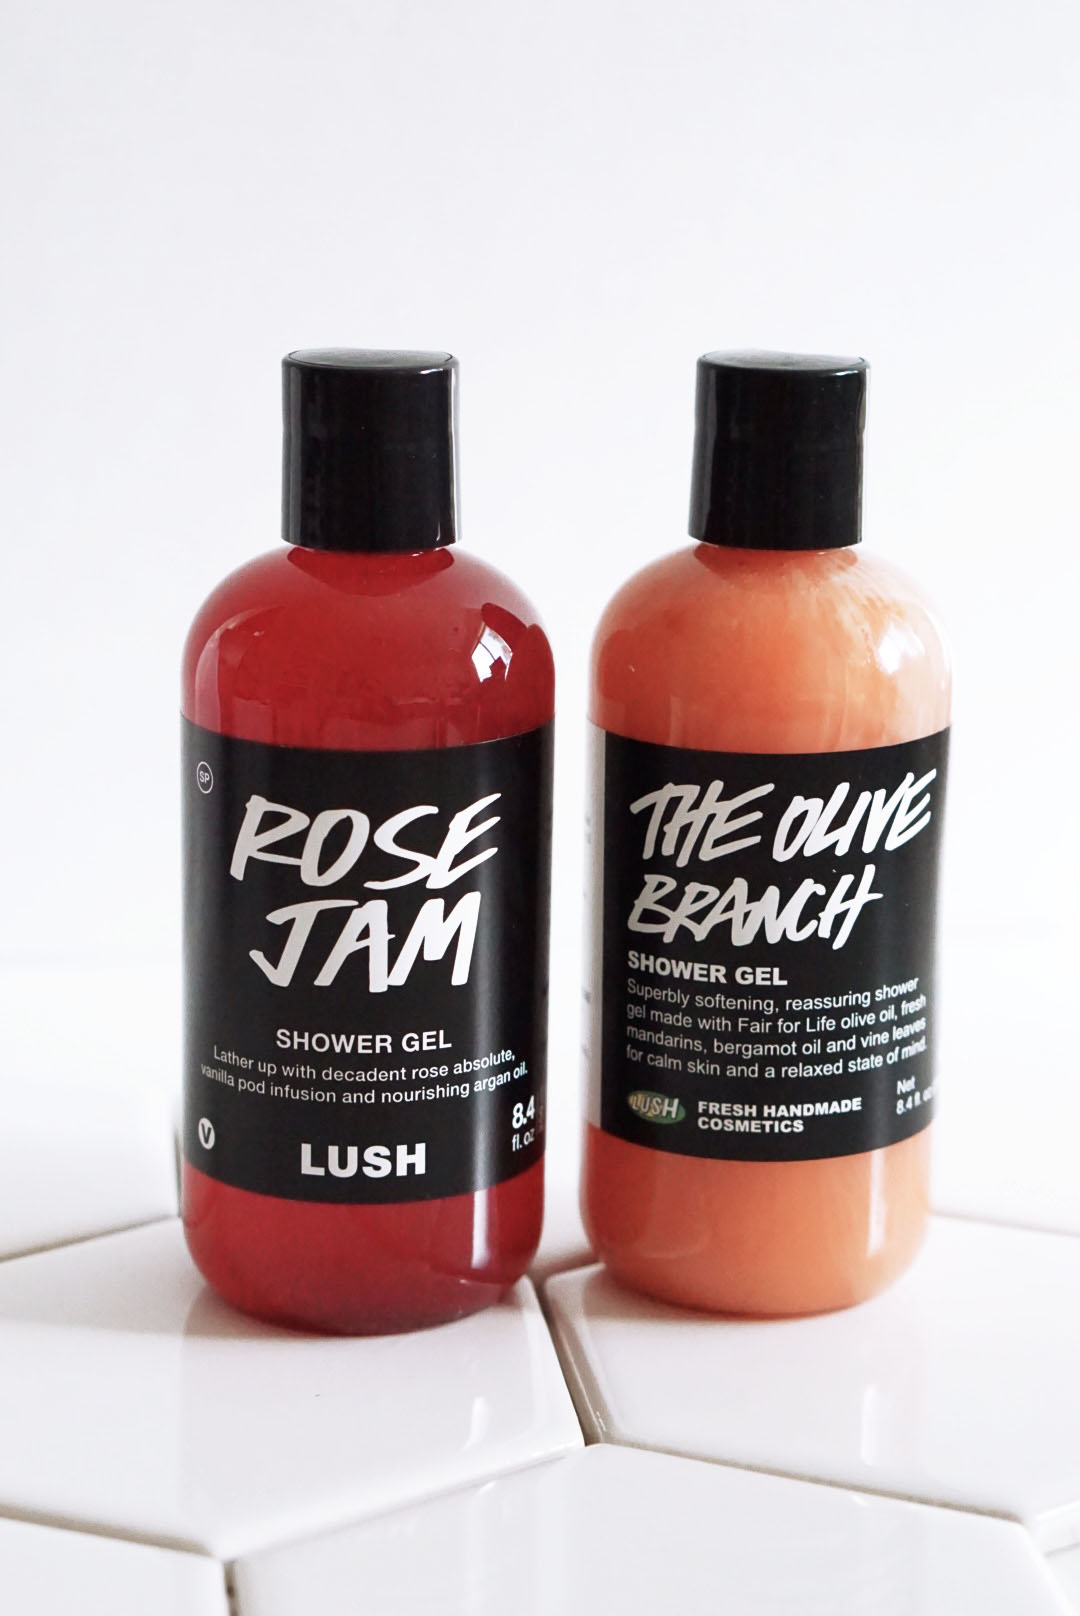 Lush-Body-Wash-Olive-Branch-Jam